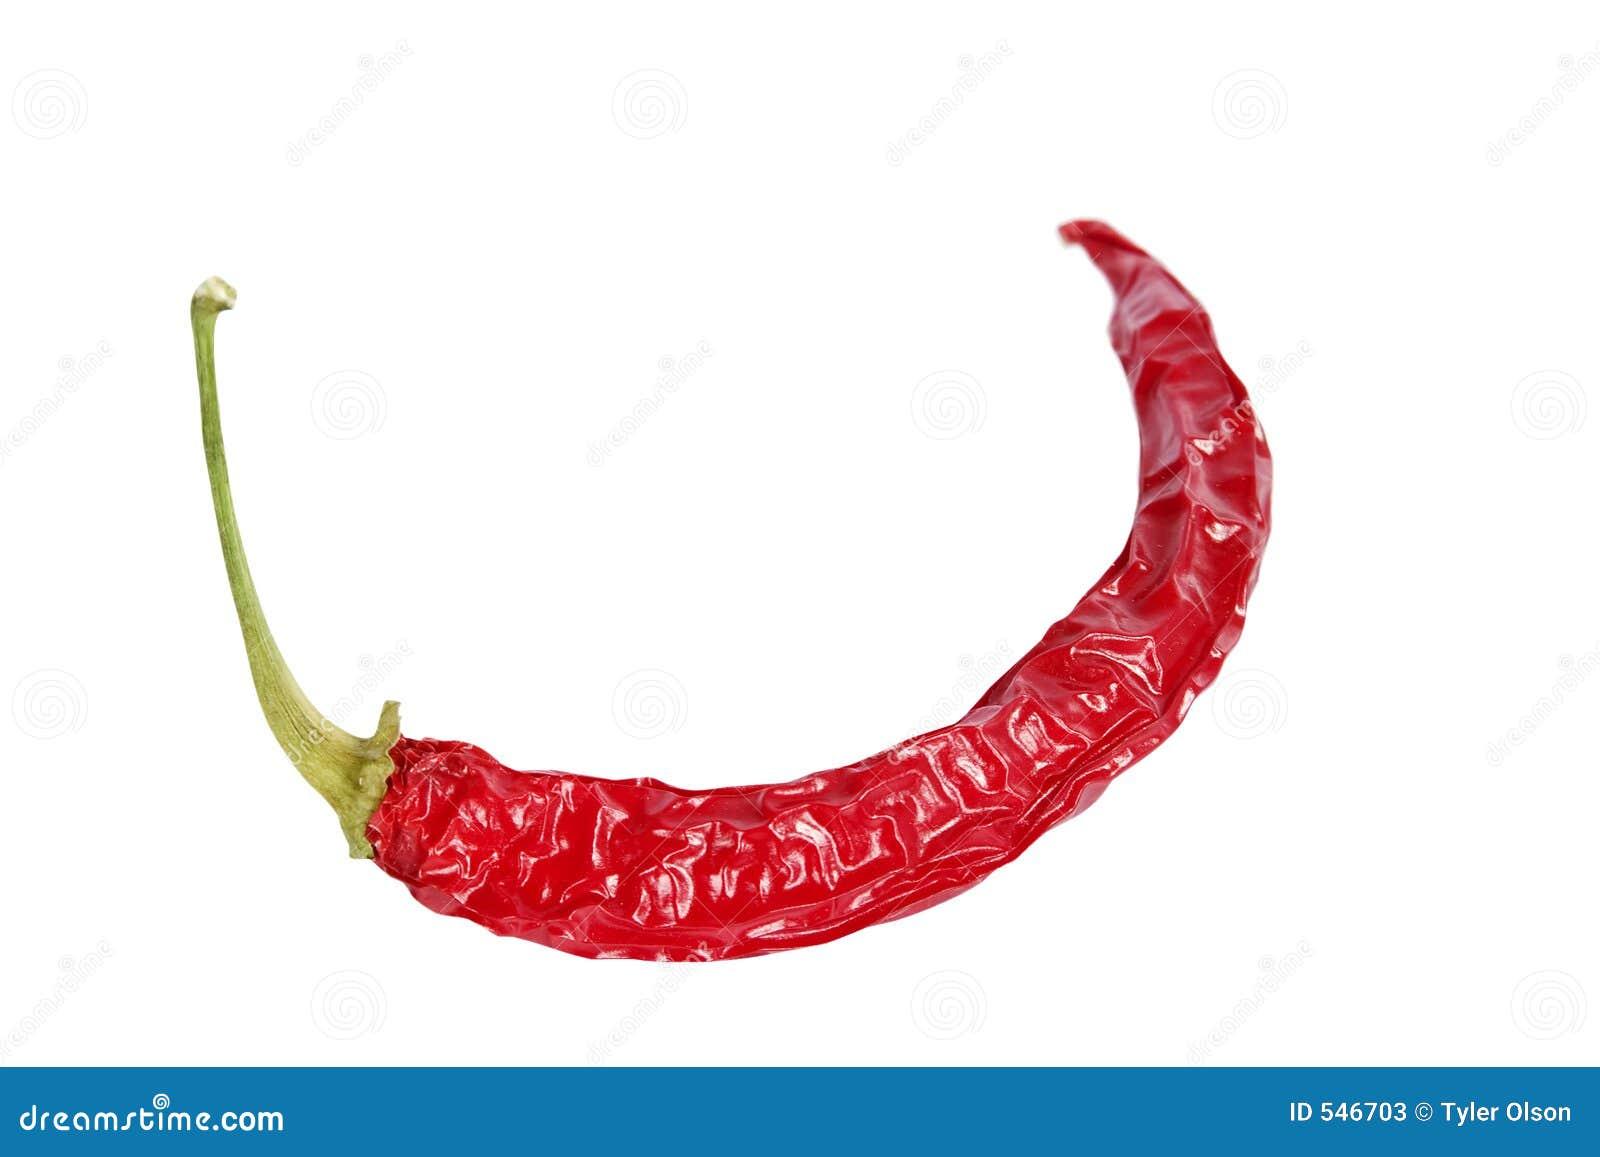 Download 辣椒热红色 库存图片. 图片 包括有 烧伤, 路径, 意大利语, 片式, 工厂, 烧焦, 剪切, 本质, 屏蔽 - 546703